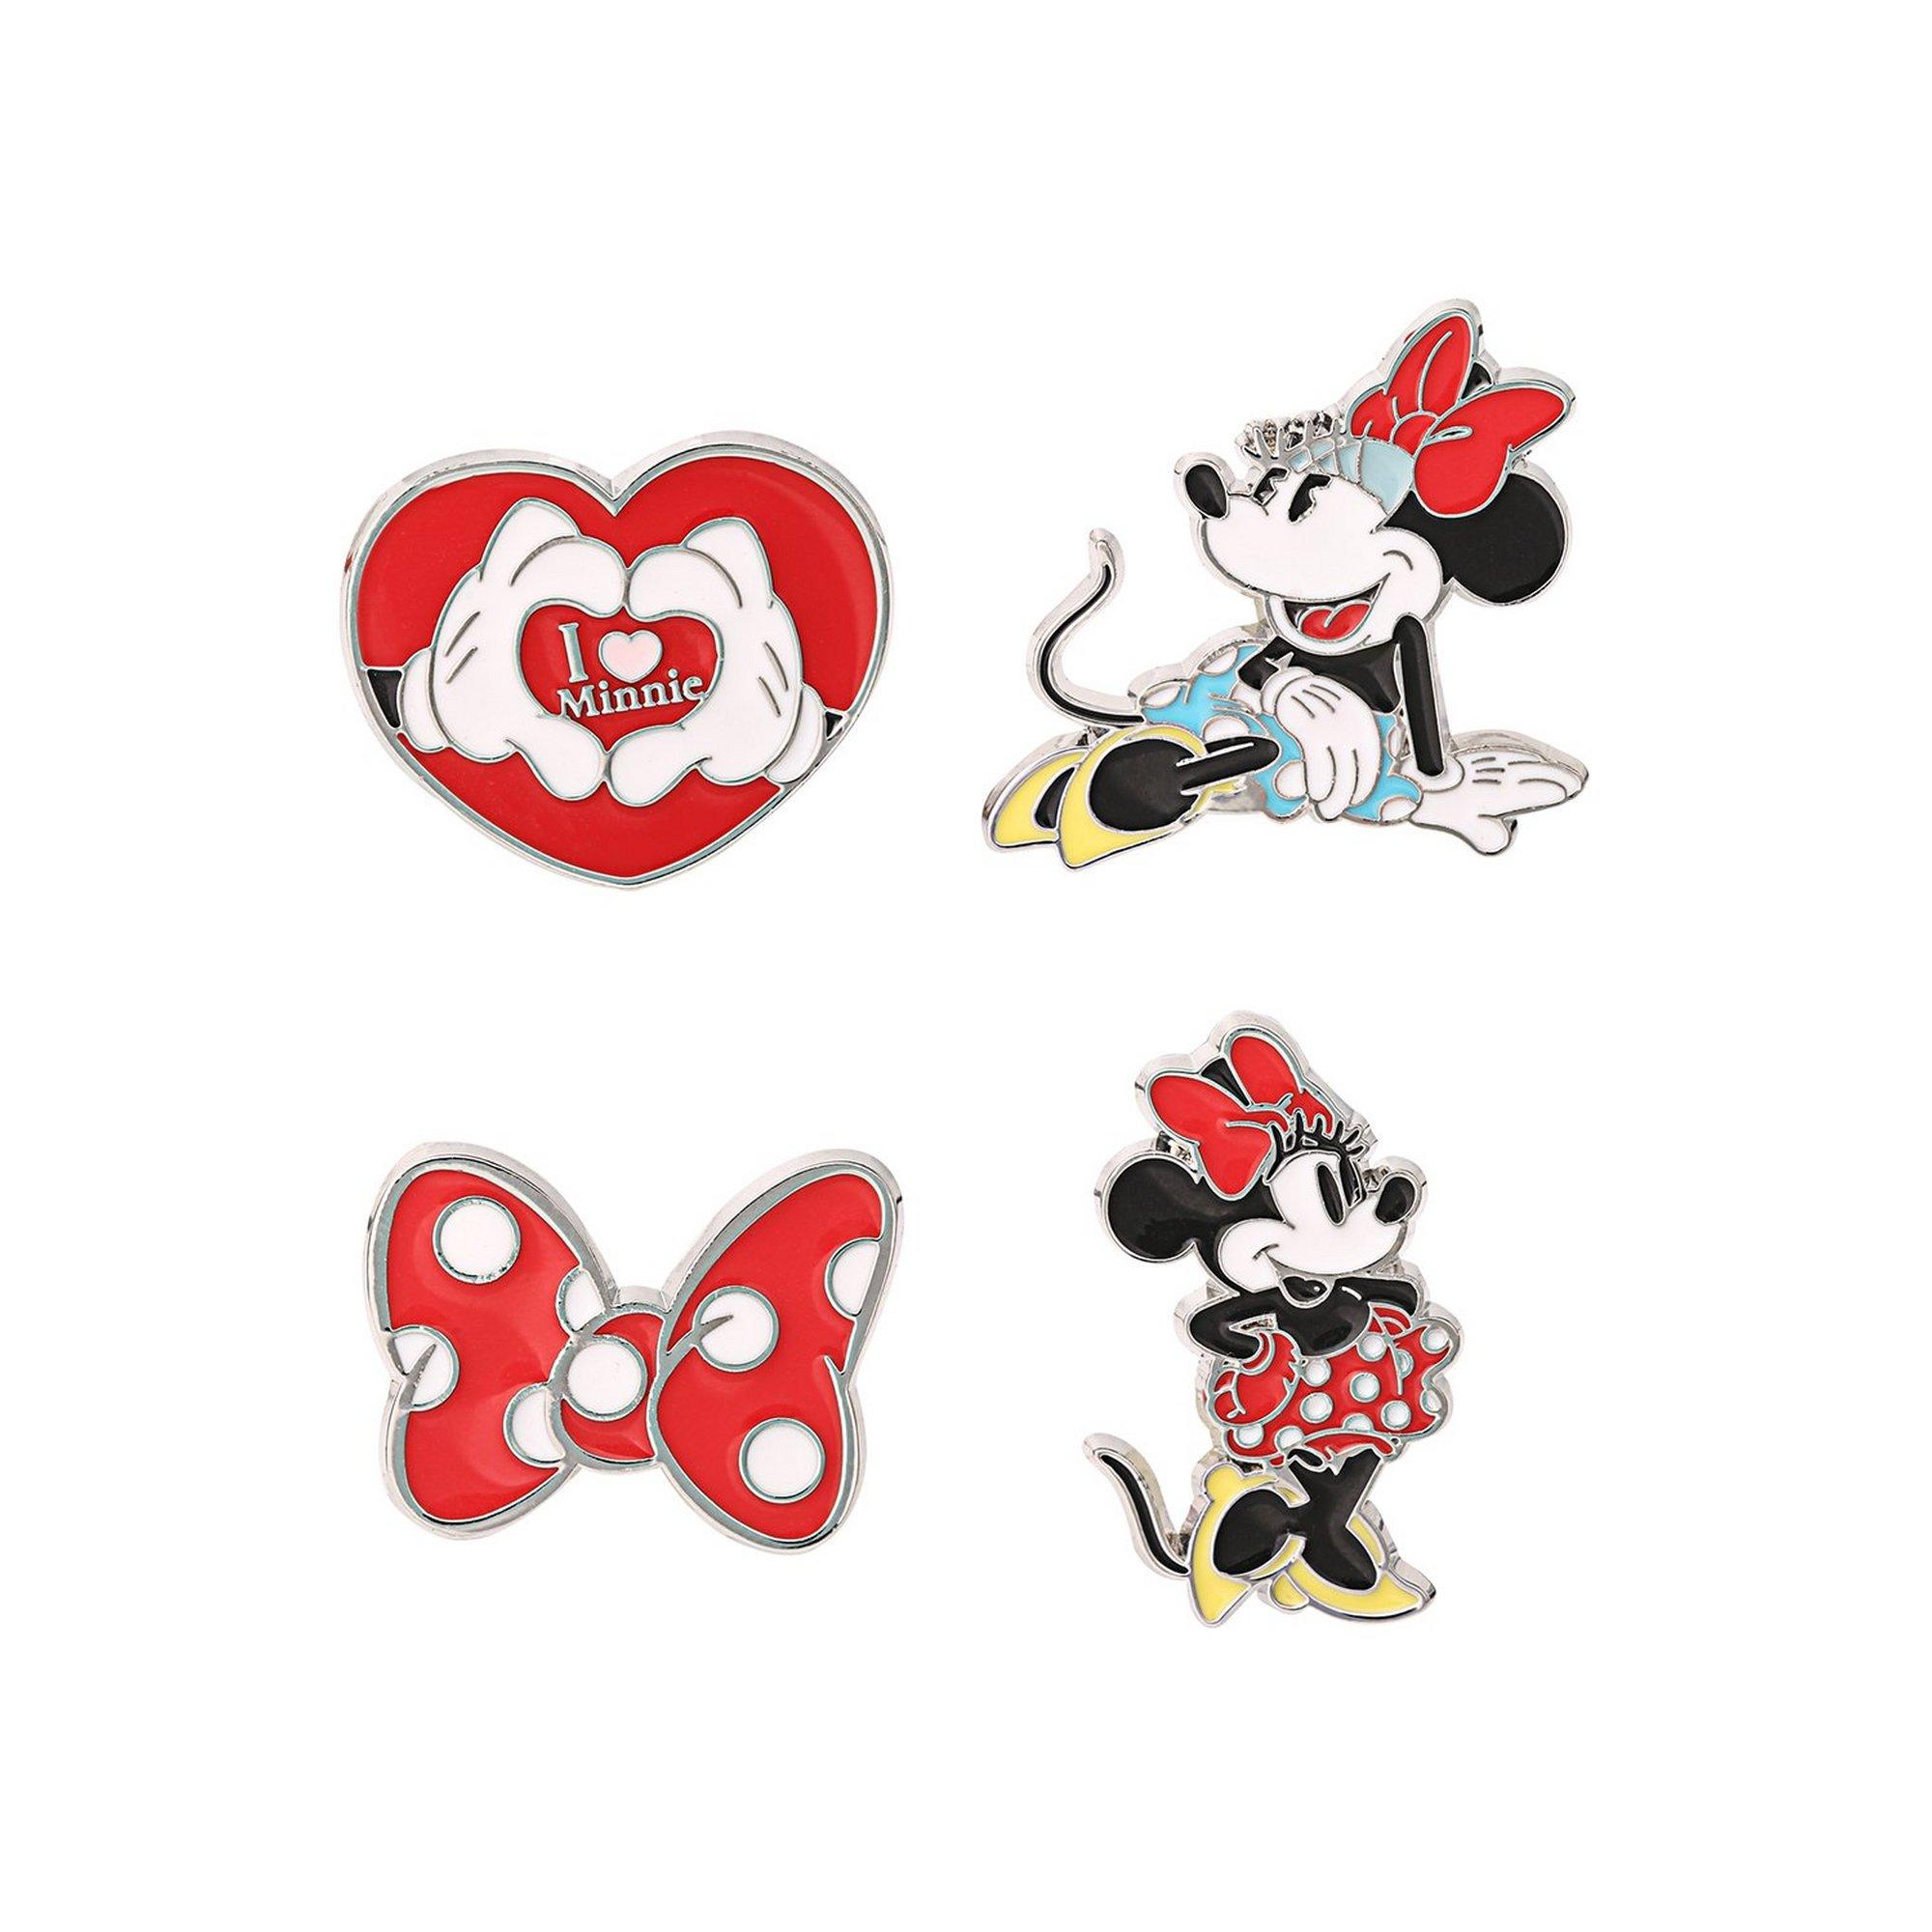 Image of Disney Mickey and Minnie Pin Badge Set